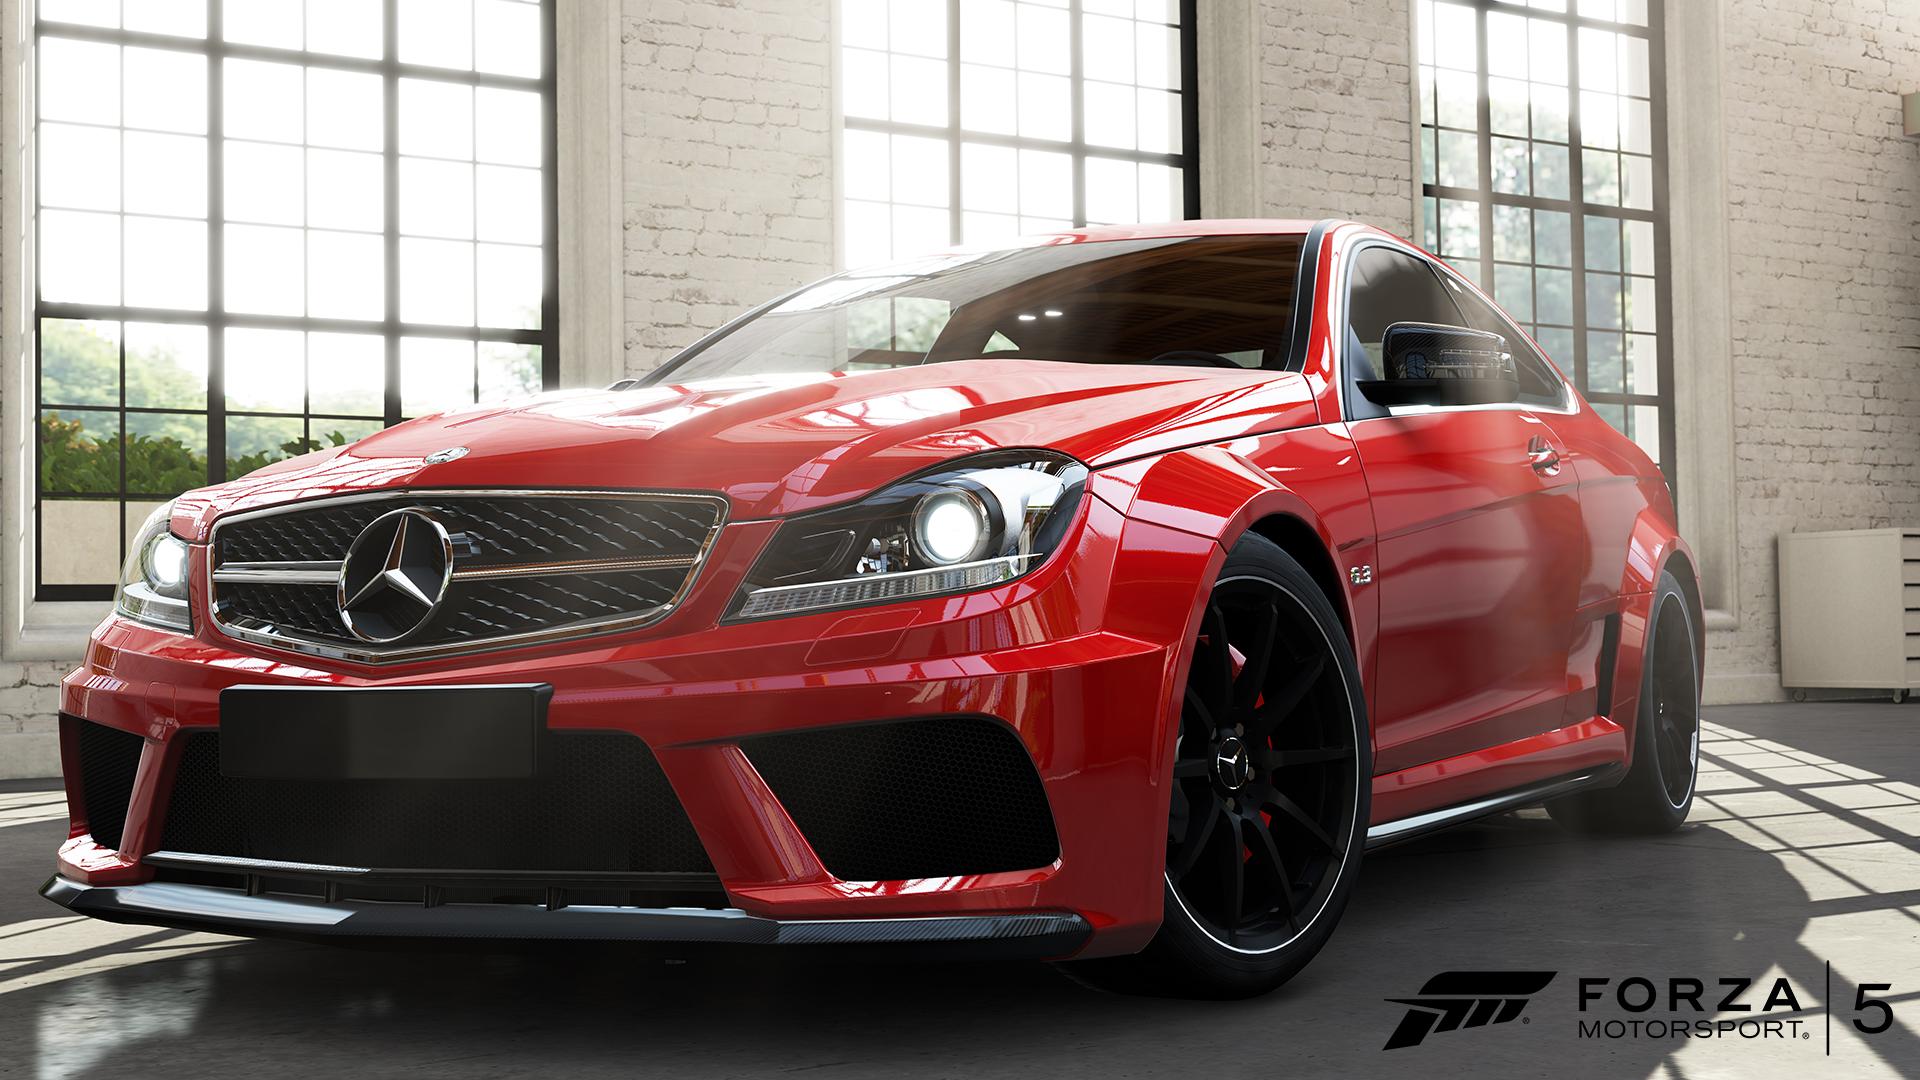 Forza Motorsport 5 Wallpaper 3348 1920 x 1080   WallpaperLayercom 1920x1080